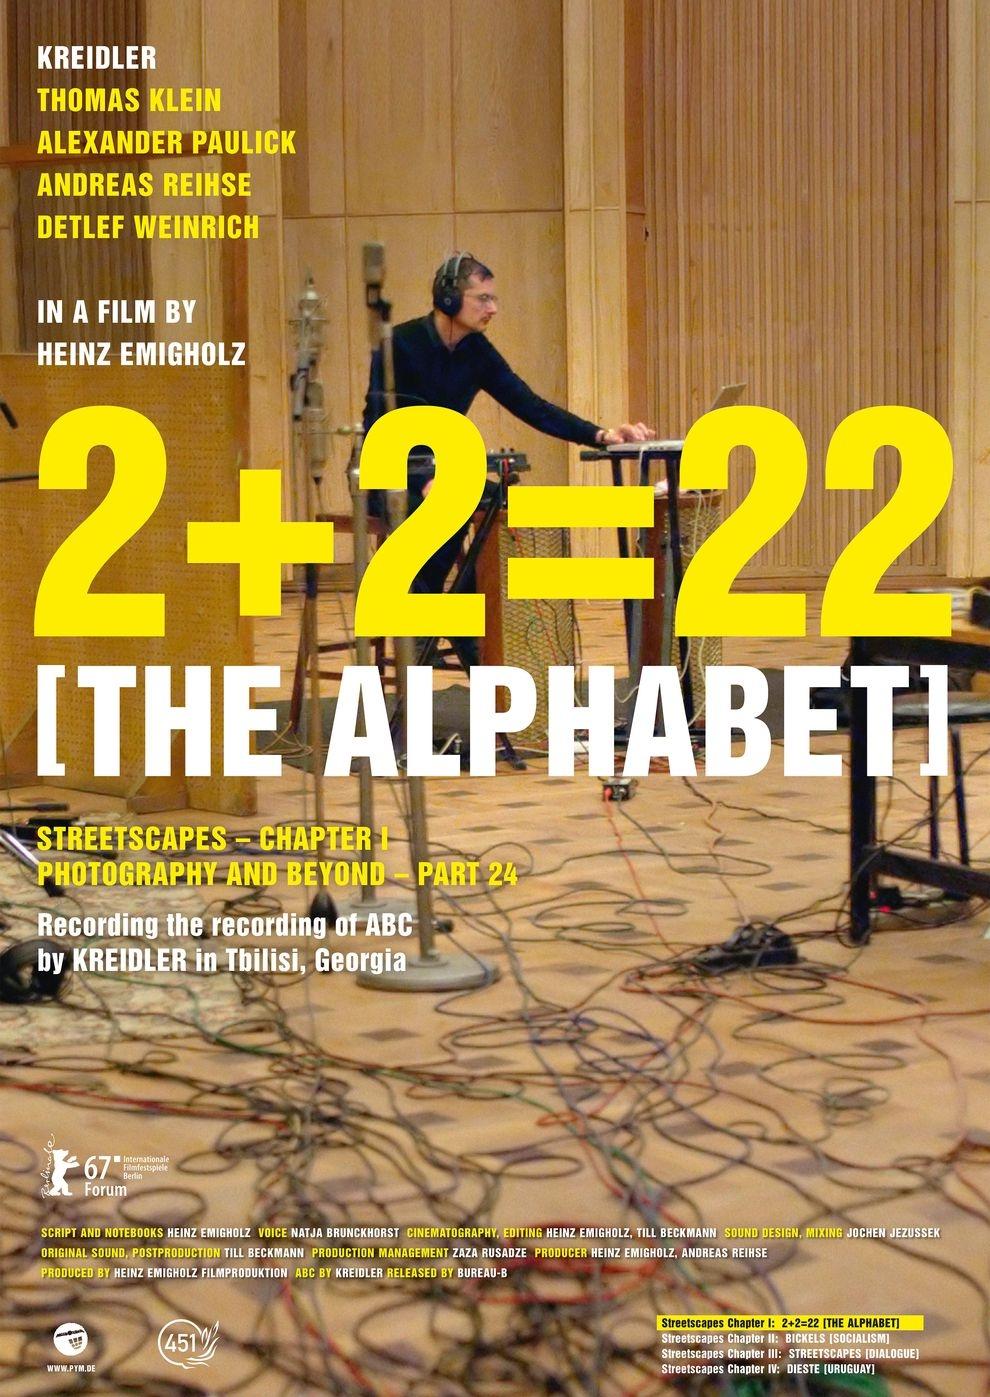 2+2=22 (The Alphabet) (Poster)